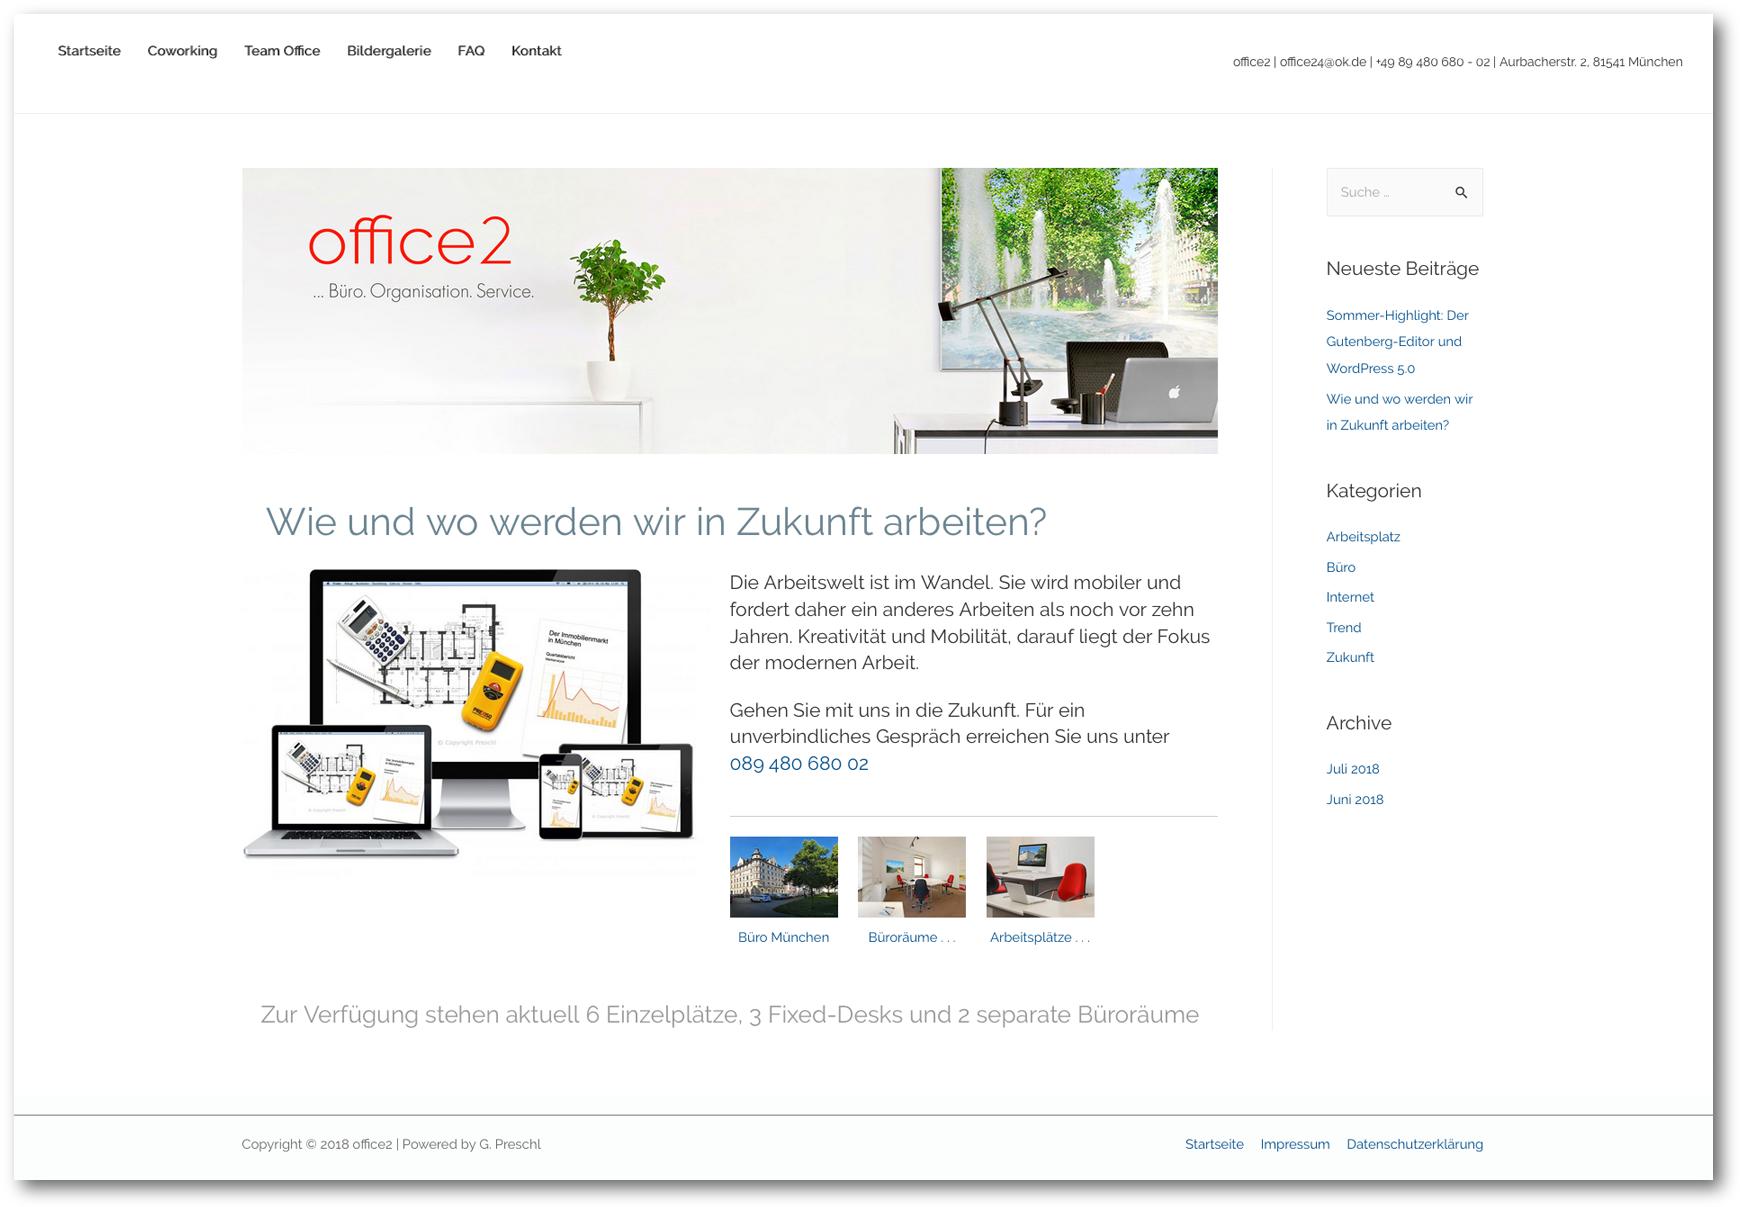 office2 - Büro. Organisation. Service.